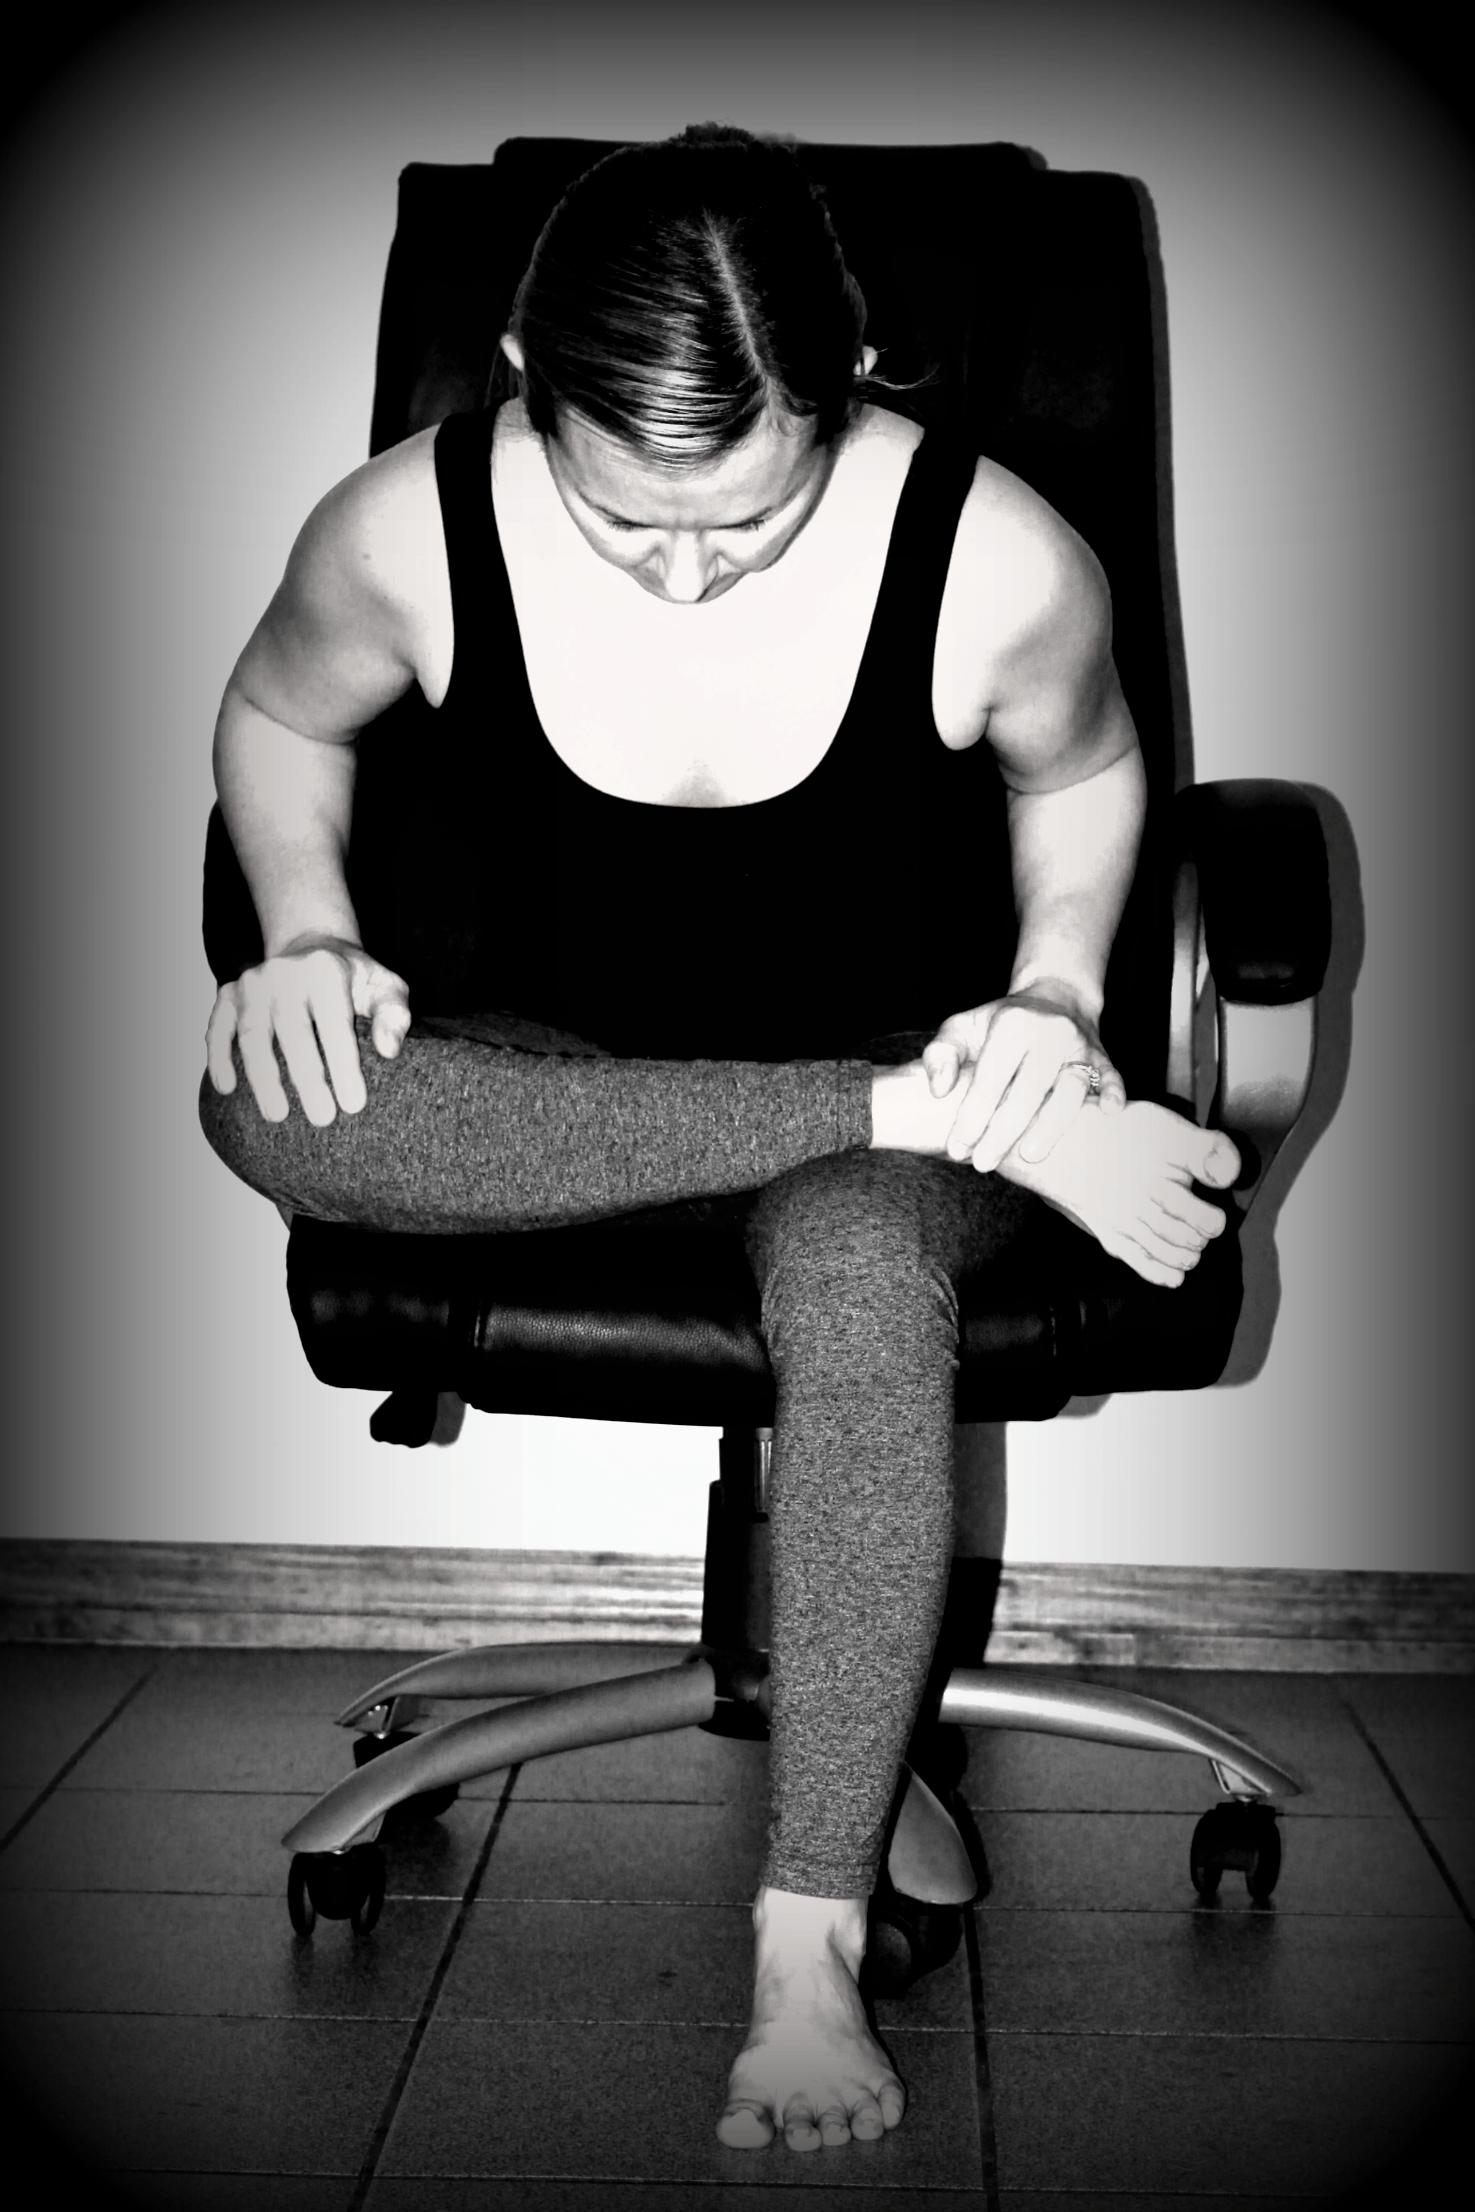 Pin on Chair Yoga. chairyogafitness silla de yoga